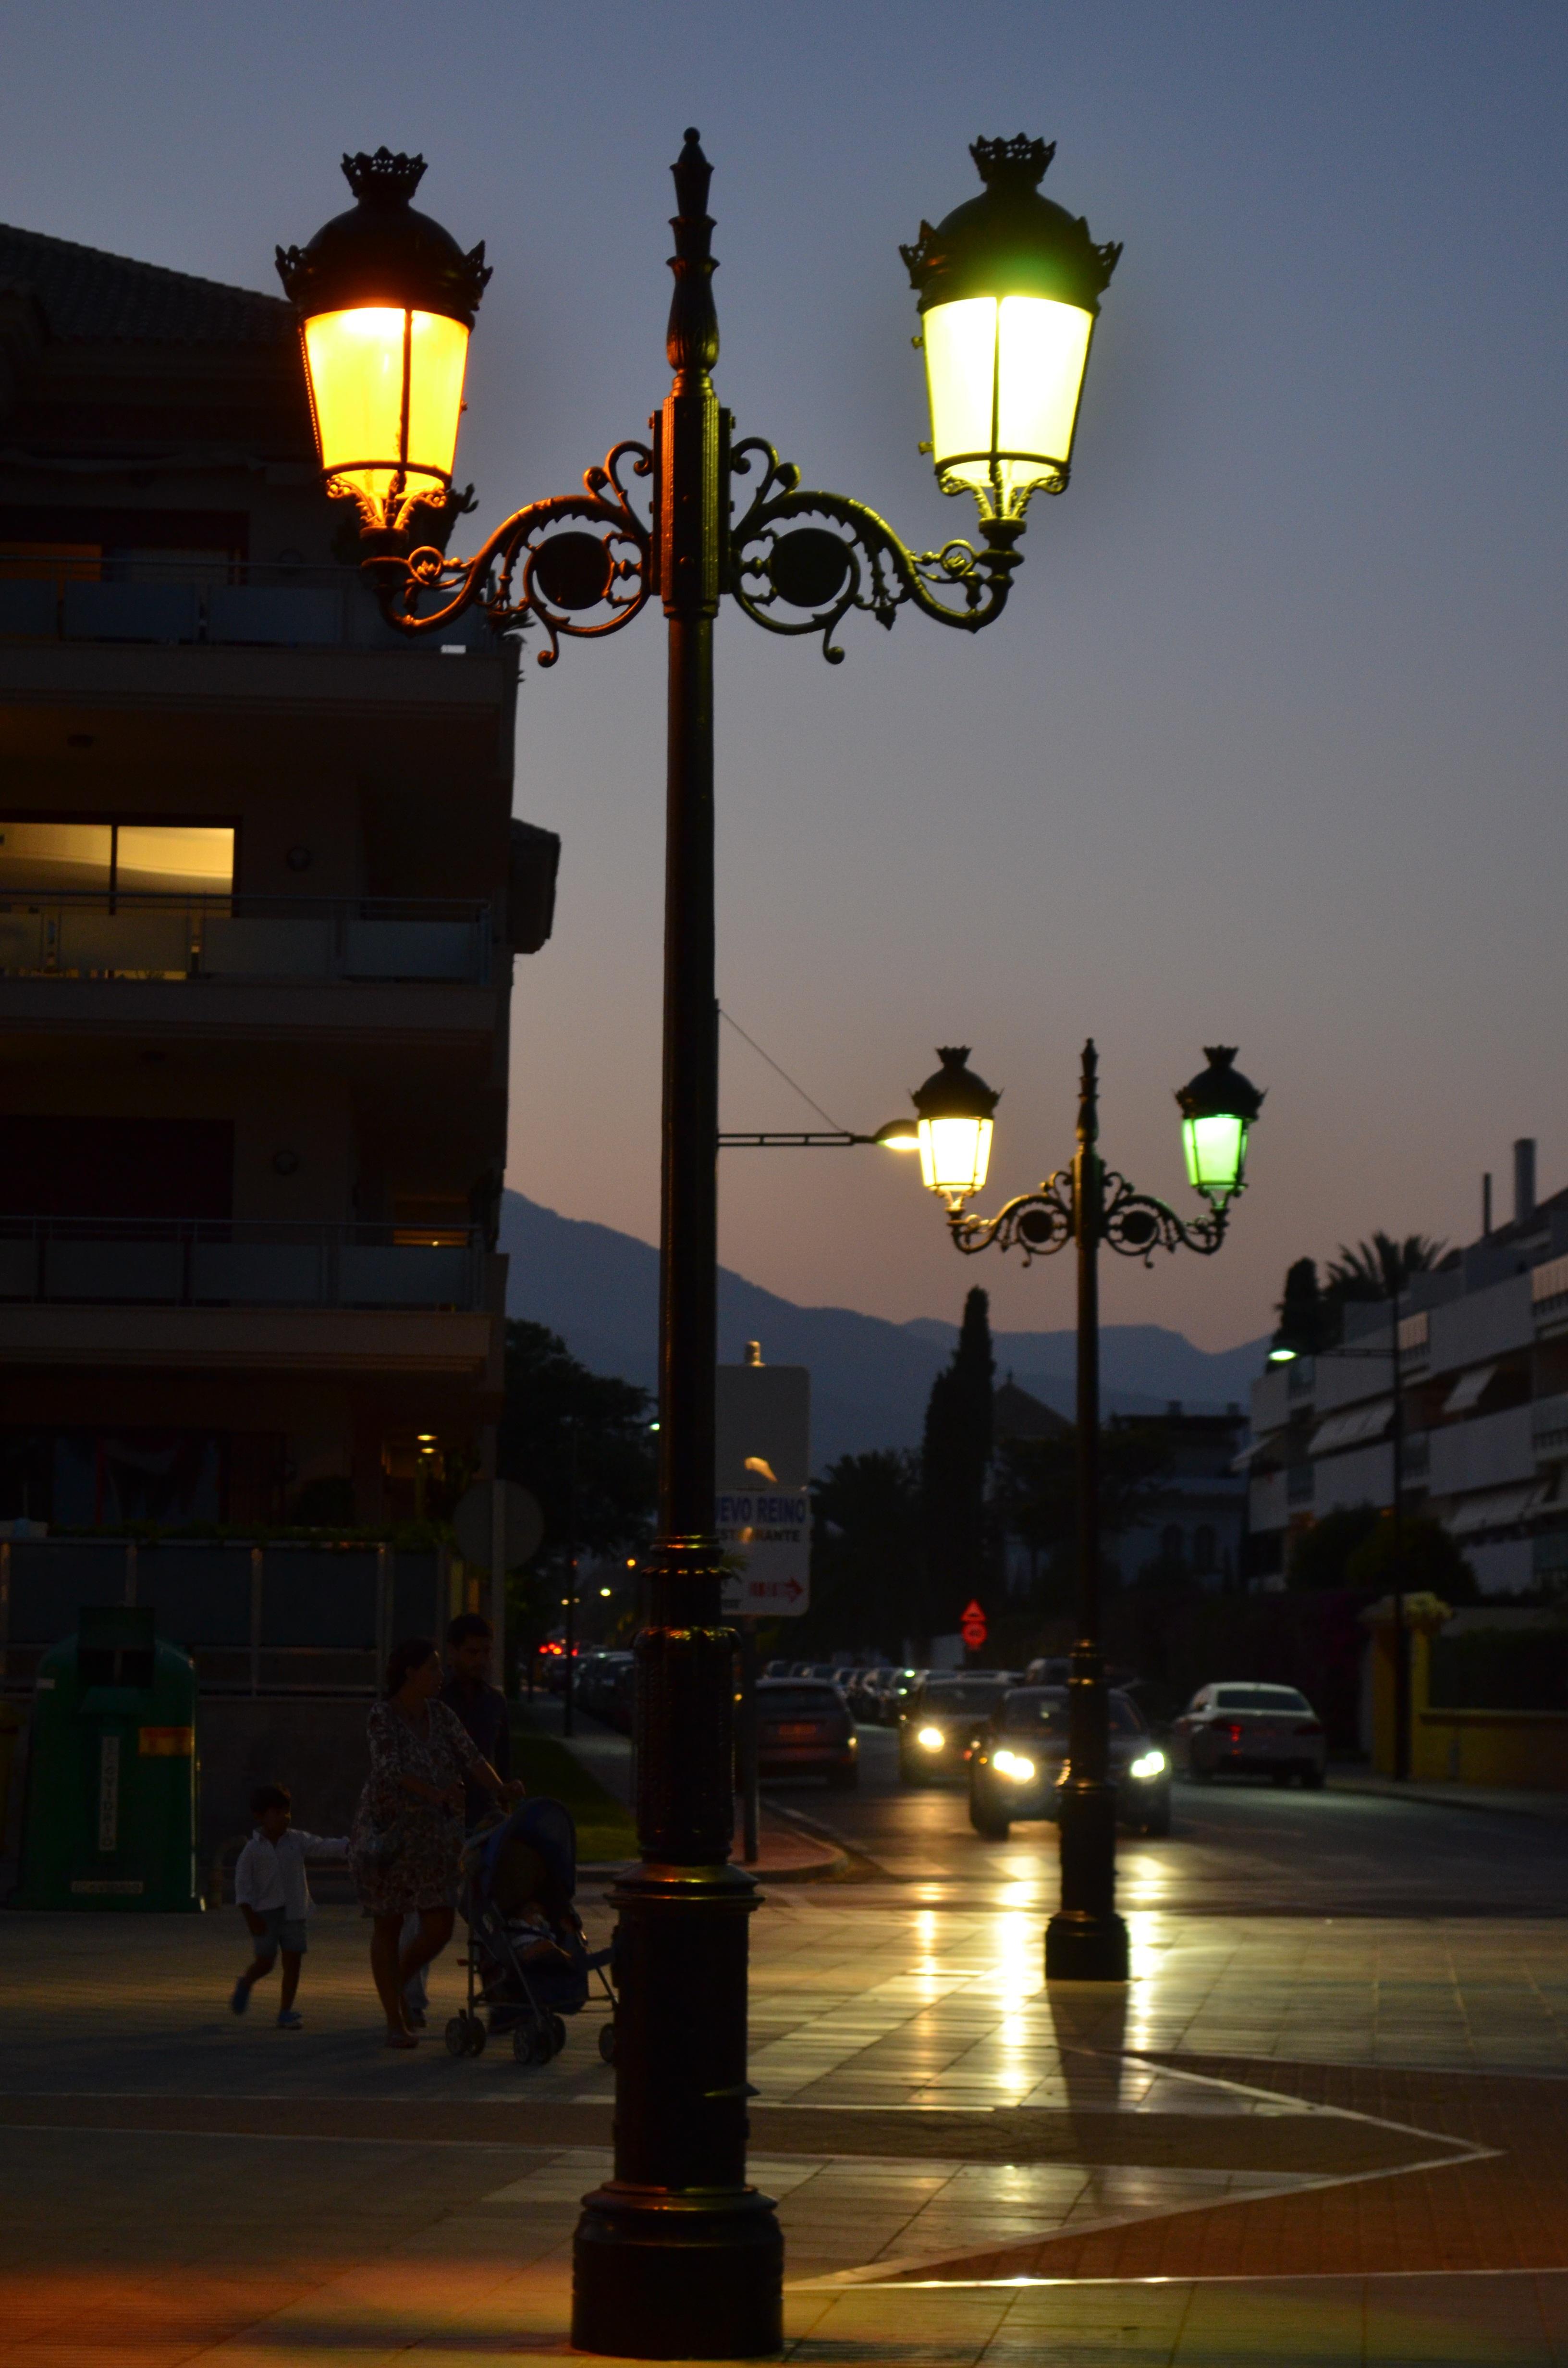 Light Sunset Night Dusk Evening Twilight Lantern Street Lamp Lighting Decor Traffic